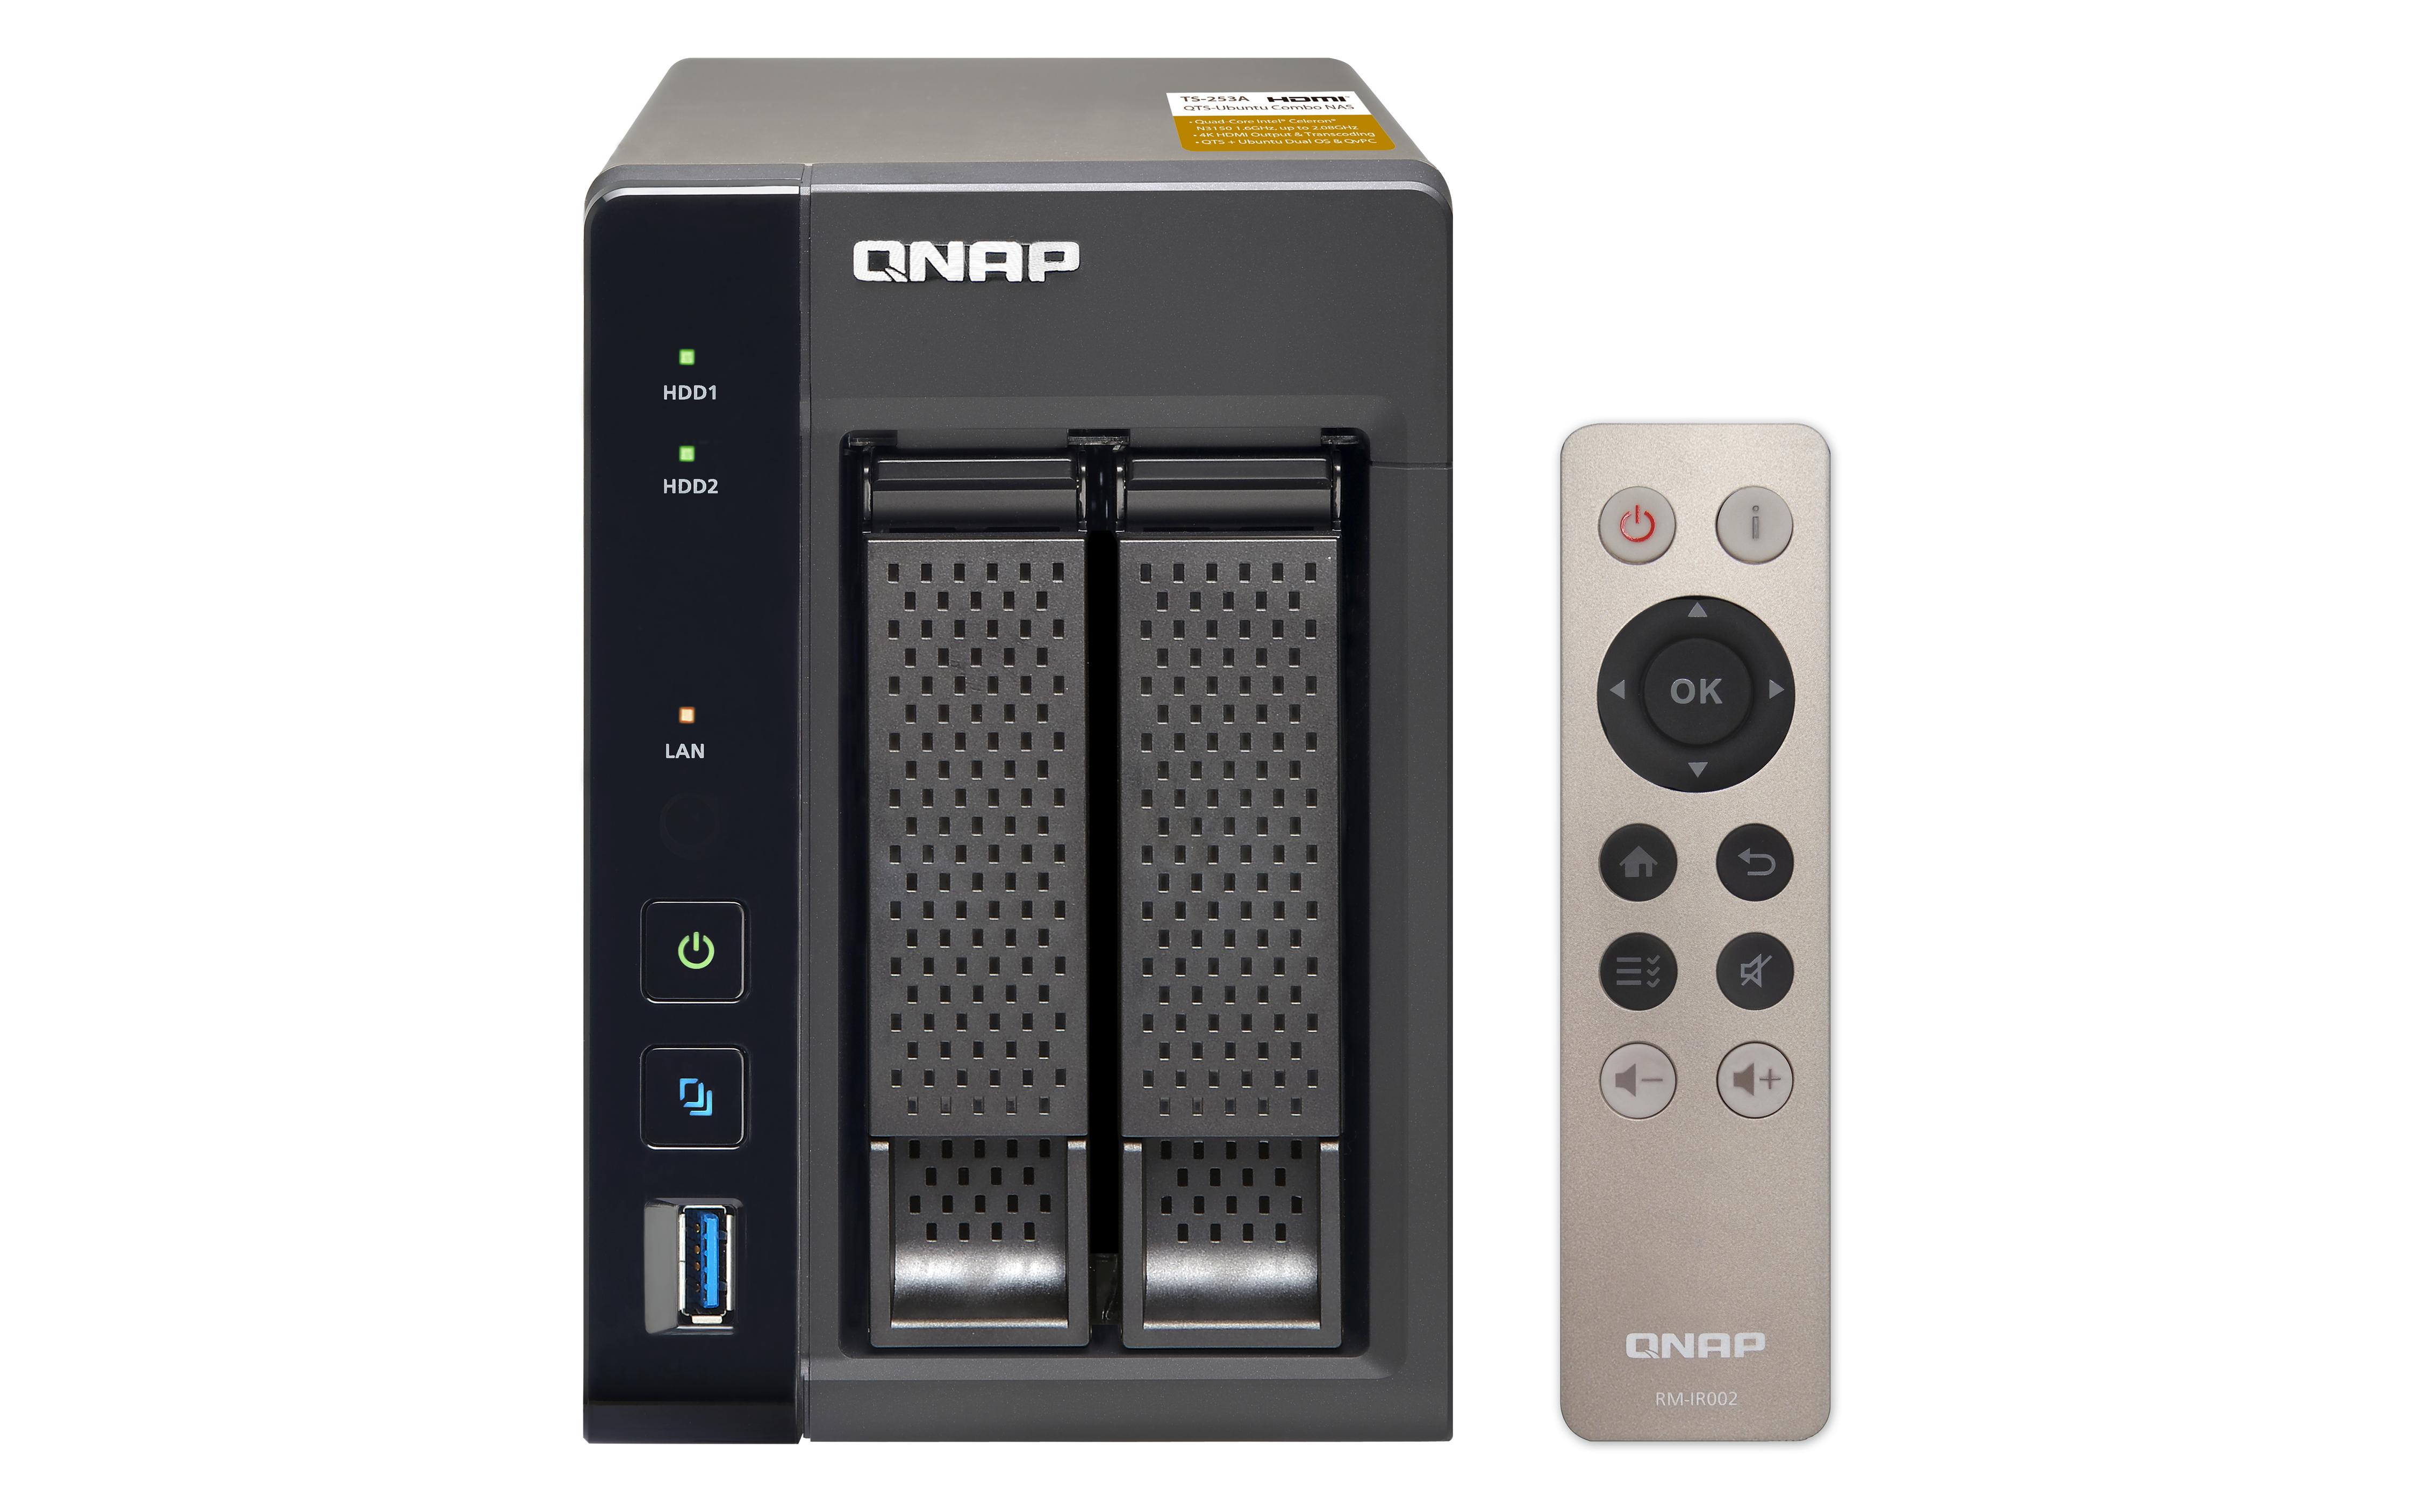 QNAP TS-253A-4G-NAS 2-Bay Intel Celeron Braswell N3150 QuadCore 1.6GHz (up to 2.08GHz) 4GB DDR3L SODIMM RAM  SATA 6Gb/s 2xGbE